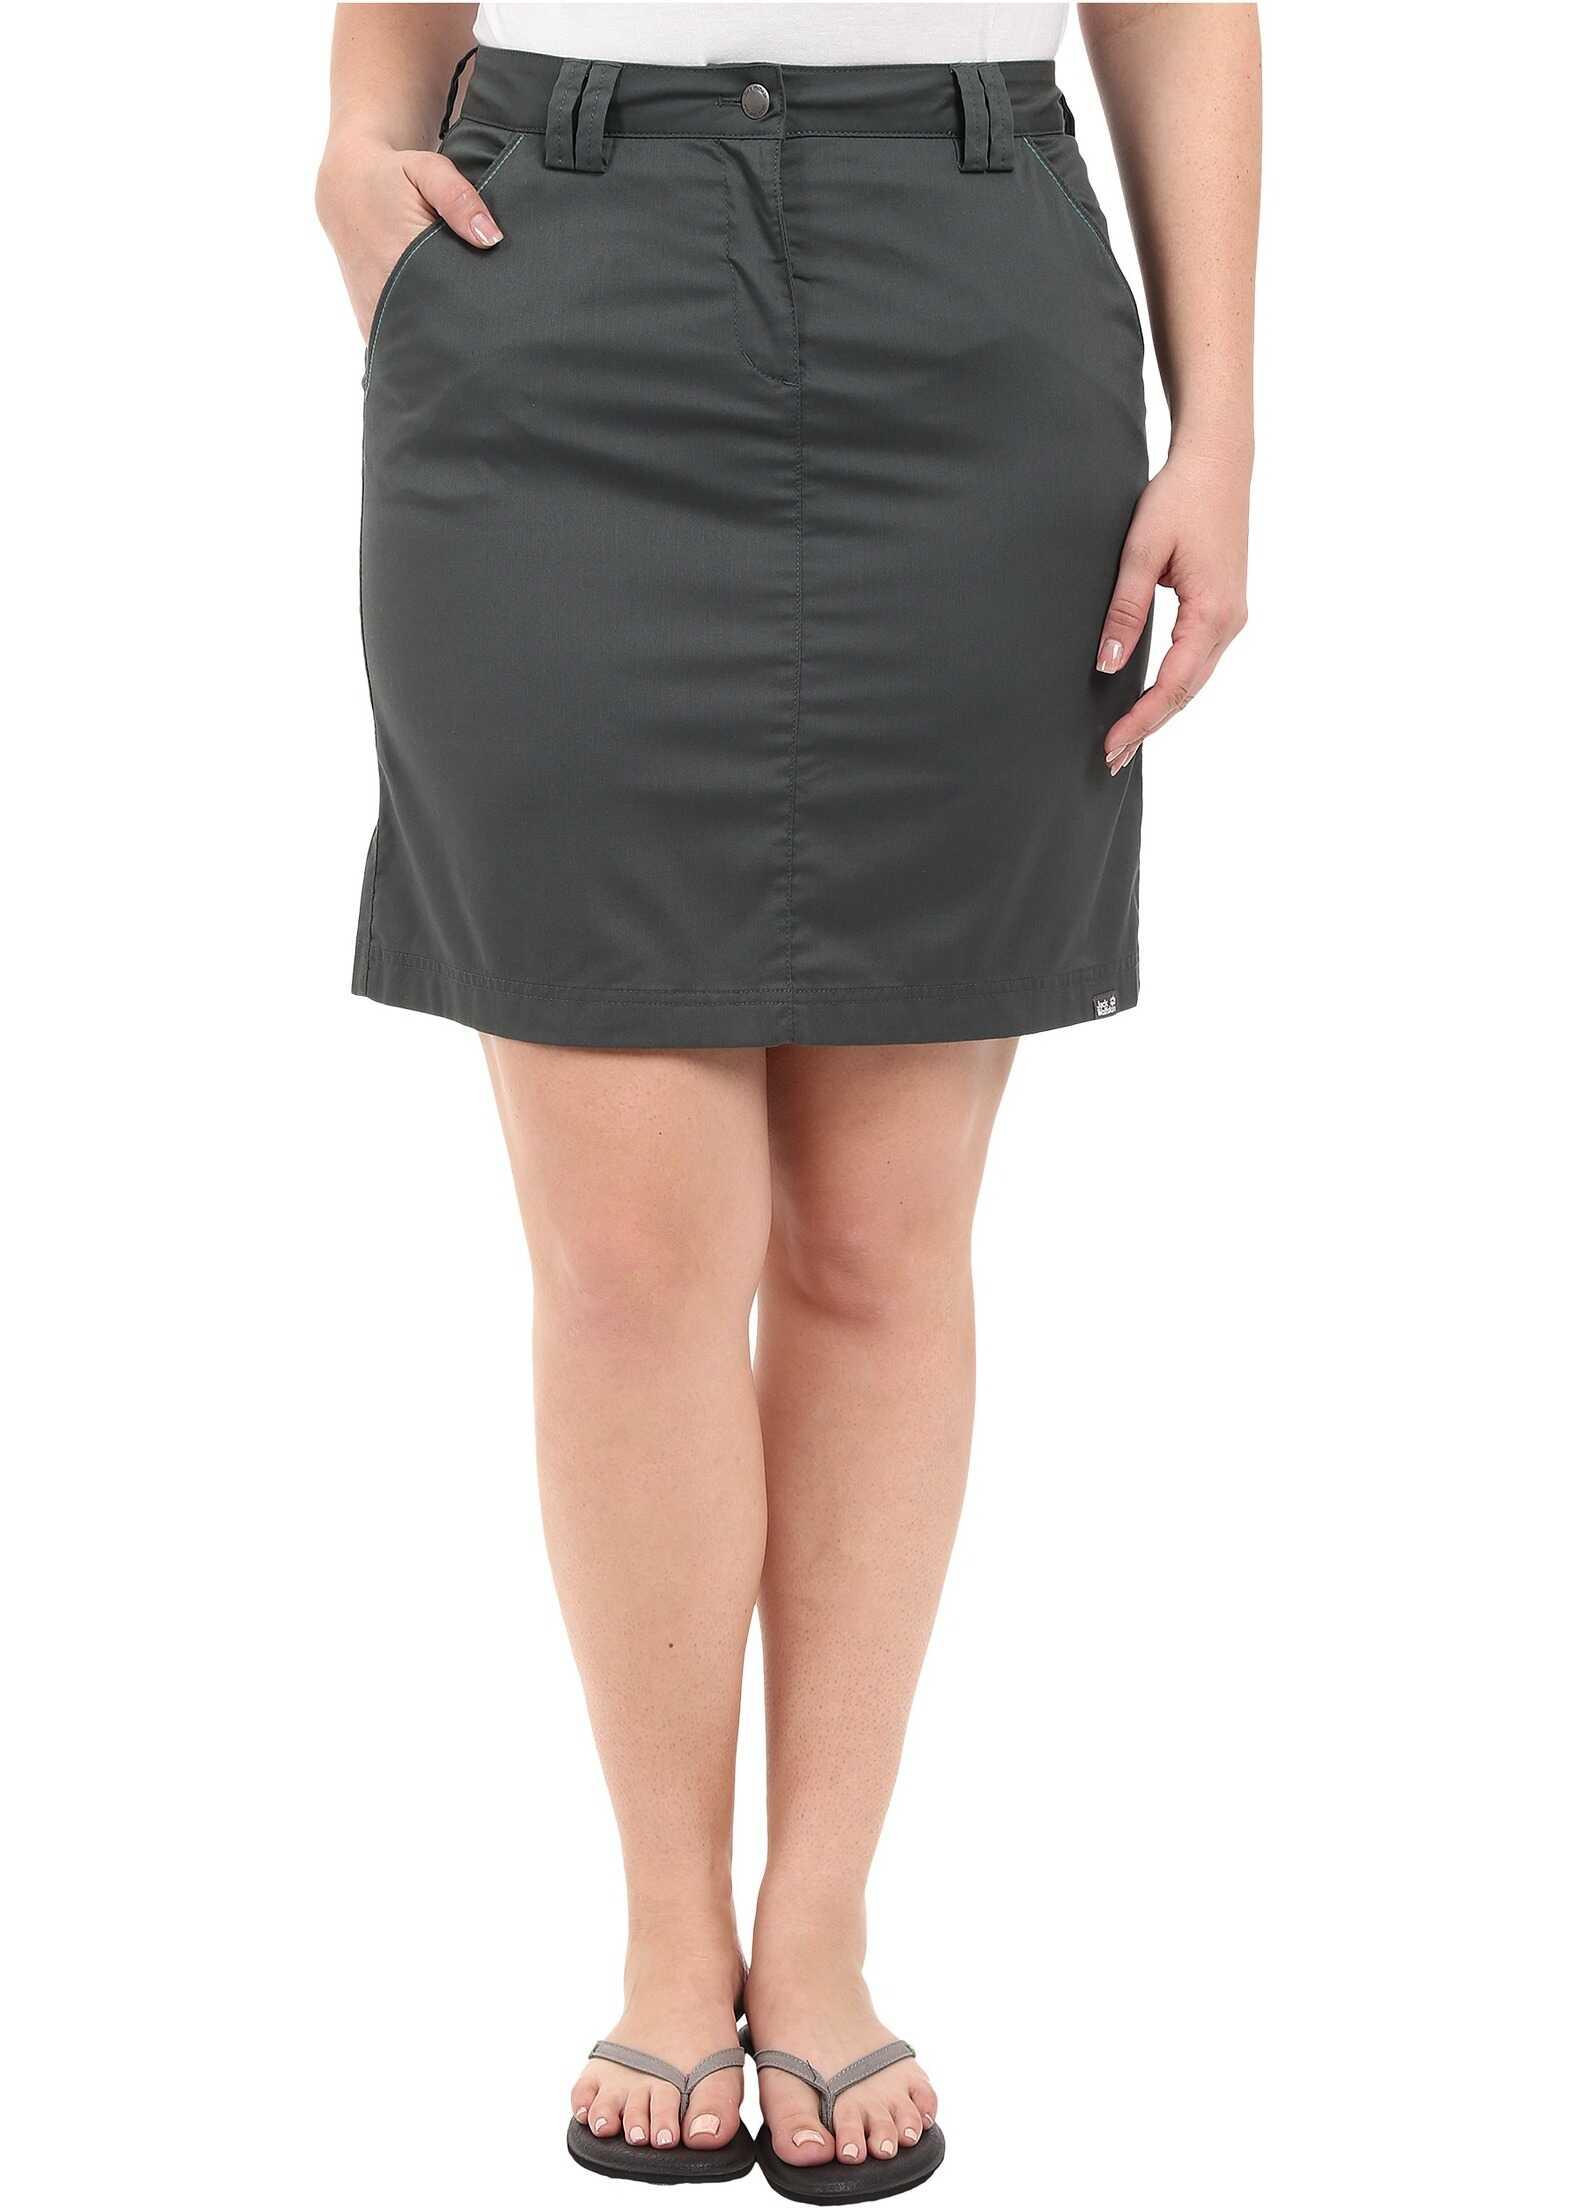 Fusta Femei Jack Wolfskin Liberty Skirt Greenish G